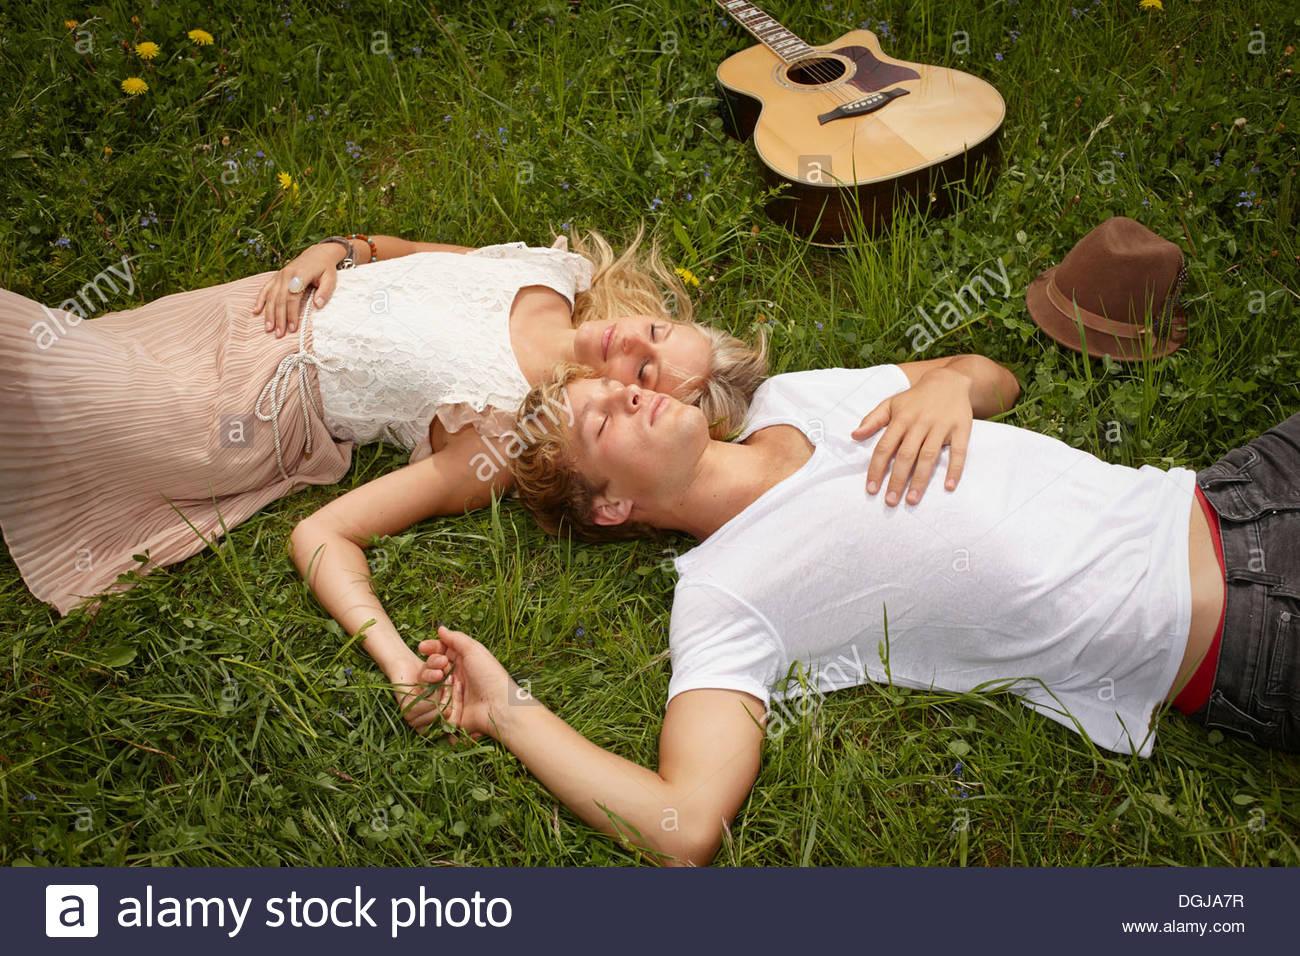 Junges Paar liegen auf dem Rasen mit Augen geschlossen Stockbild